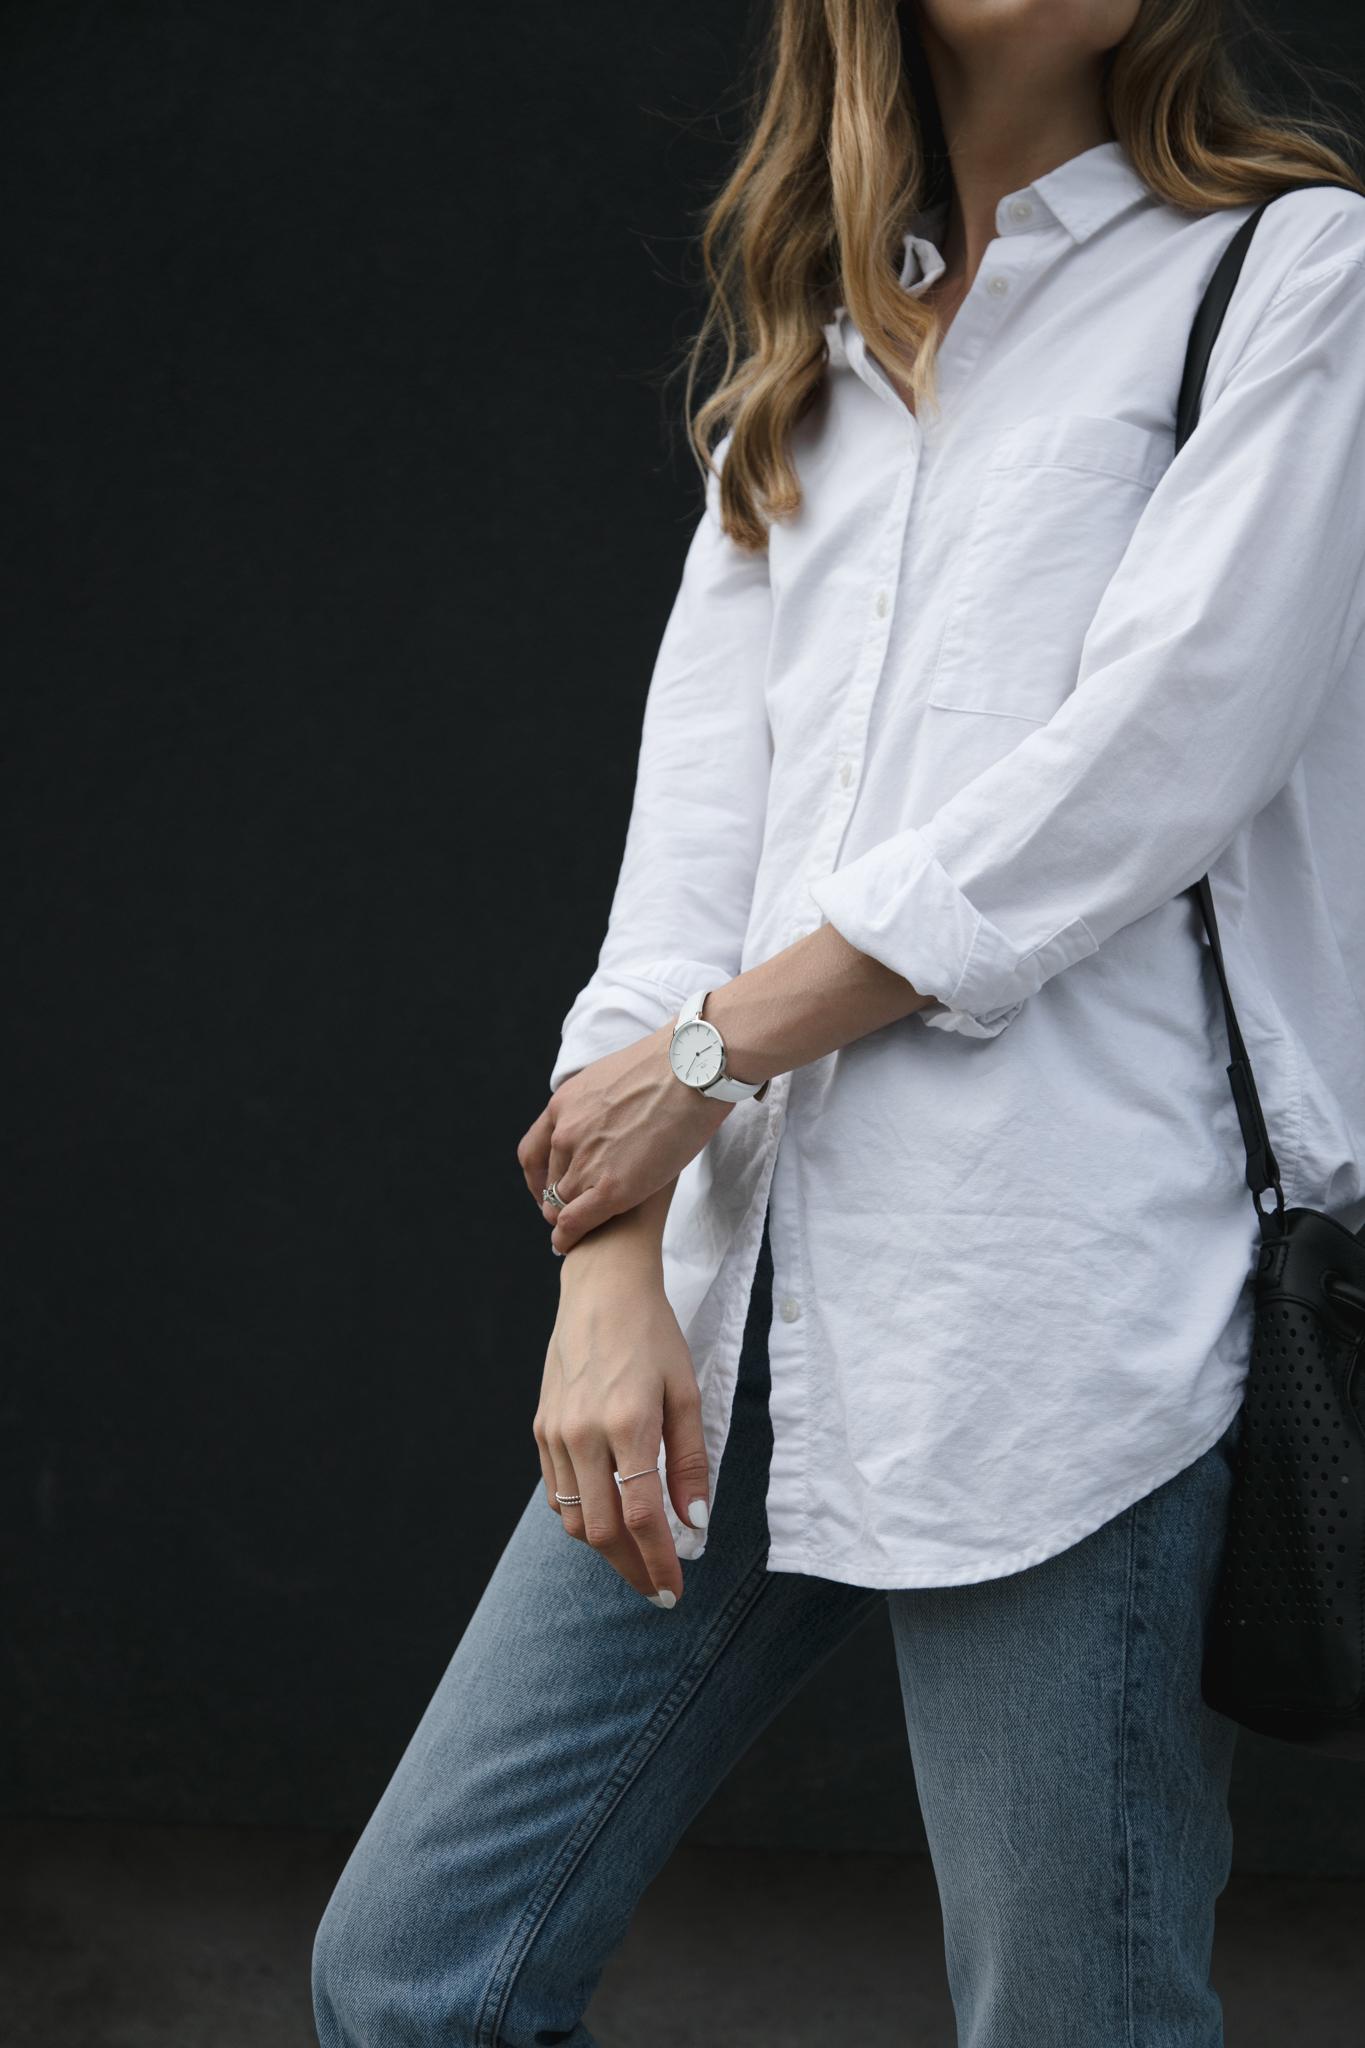 sharday-engel-frank-oak-shirt-fifth-sunglasses-helmut-lang-jeans6000.jpg